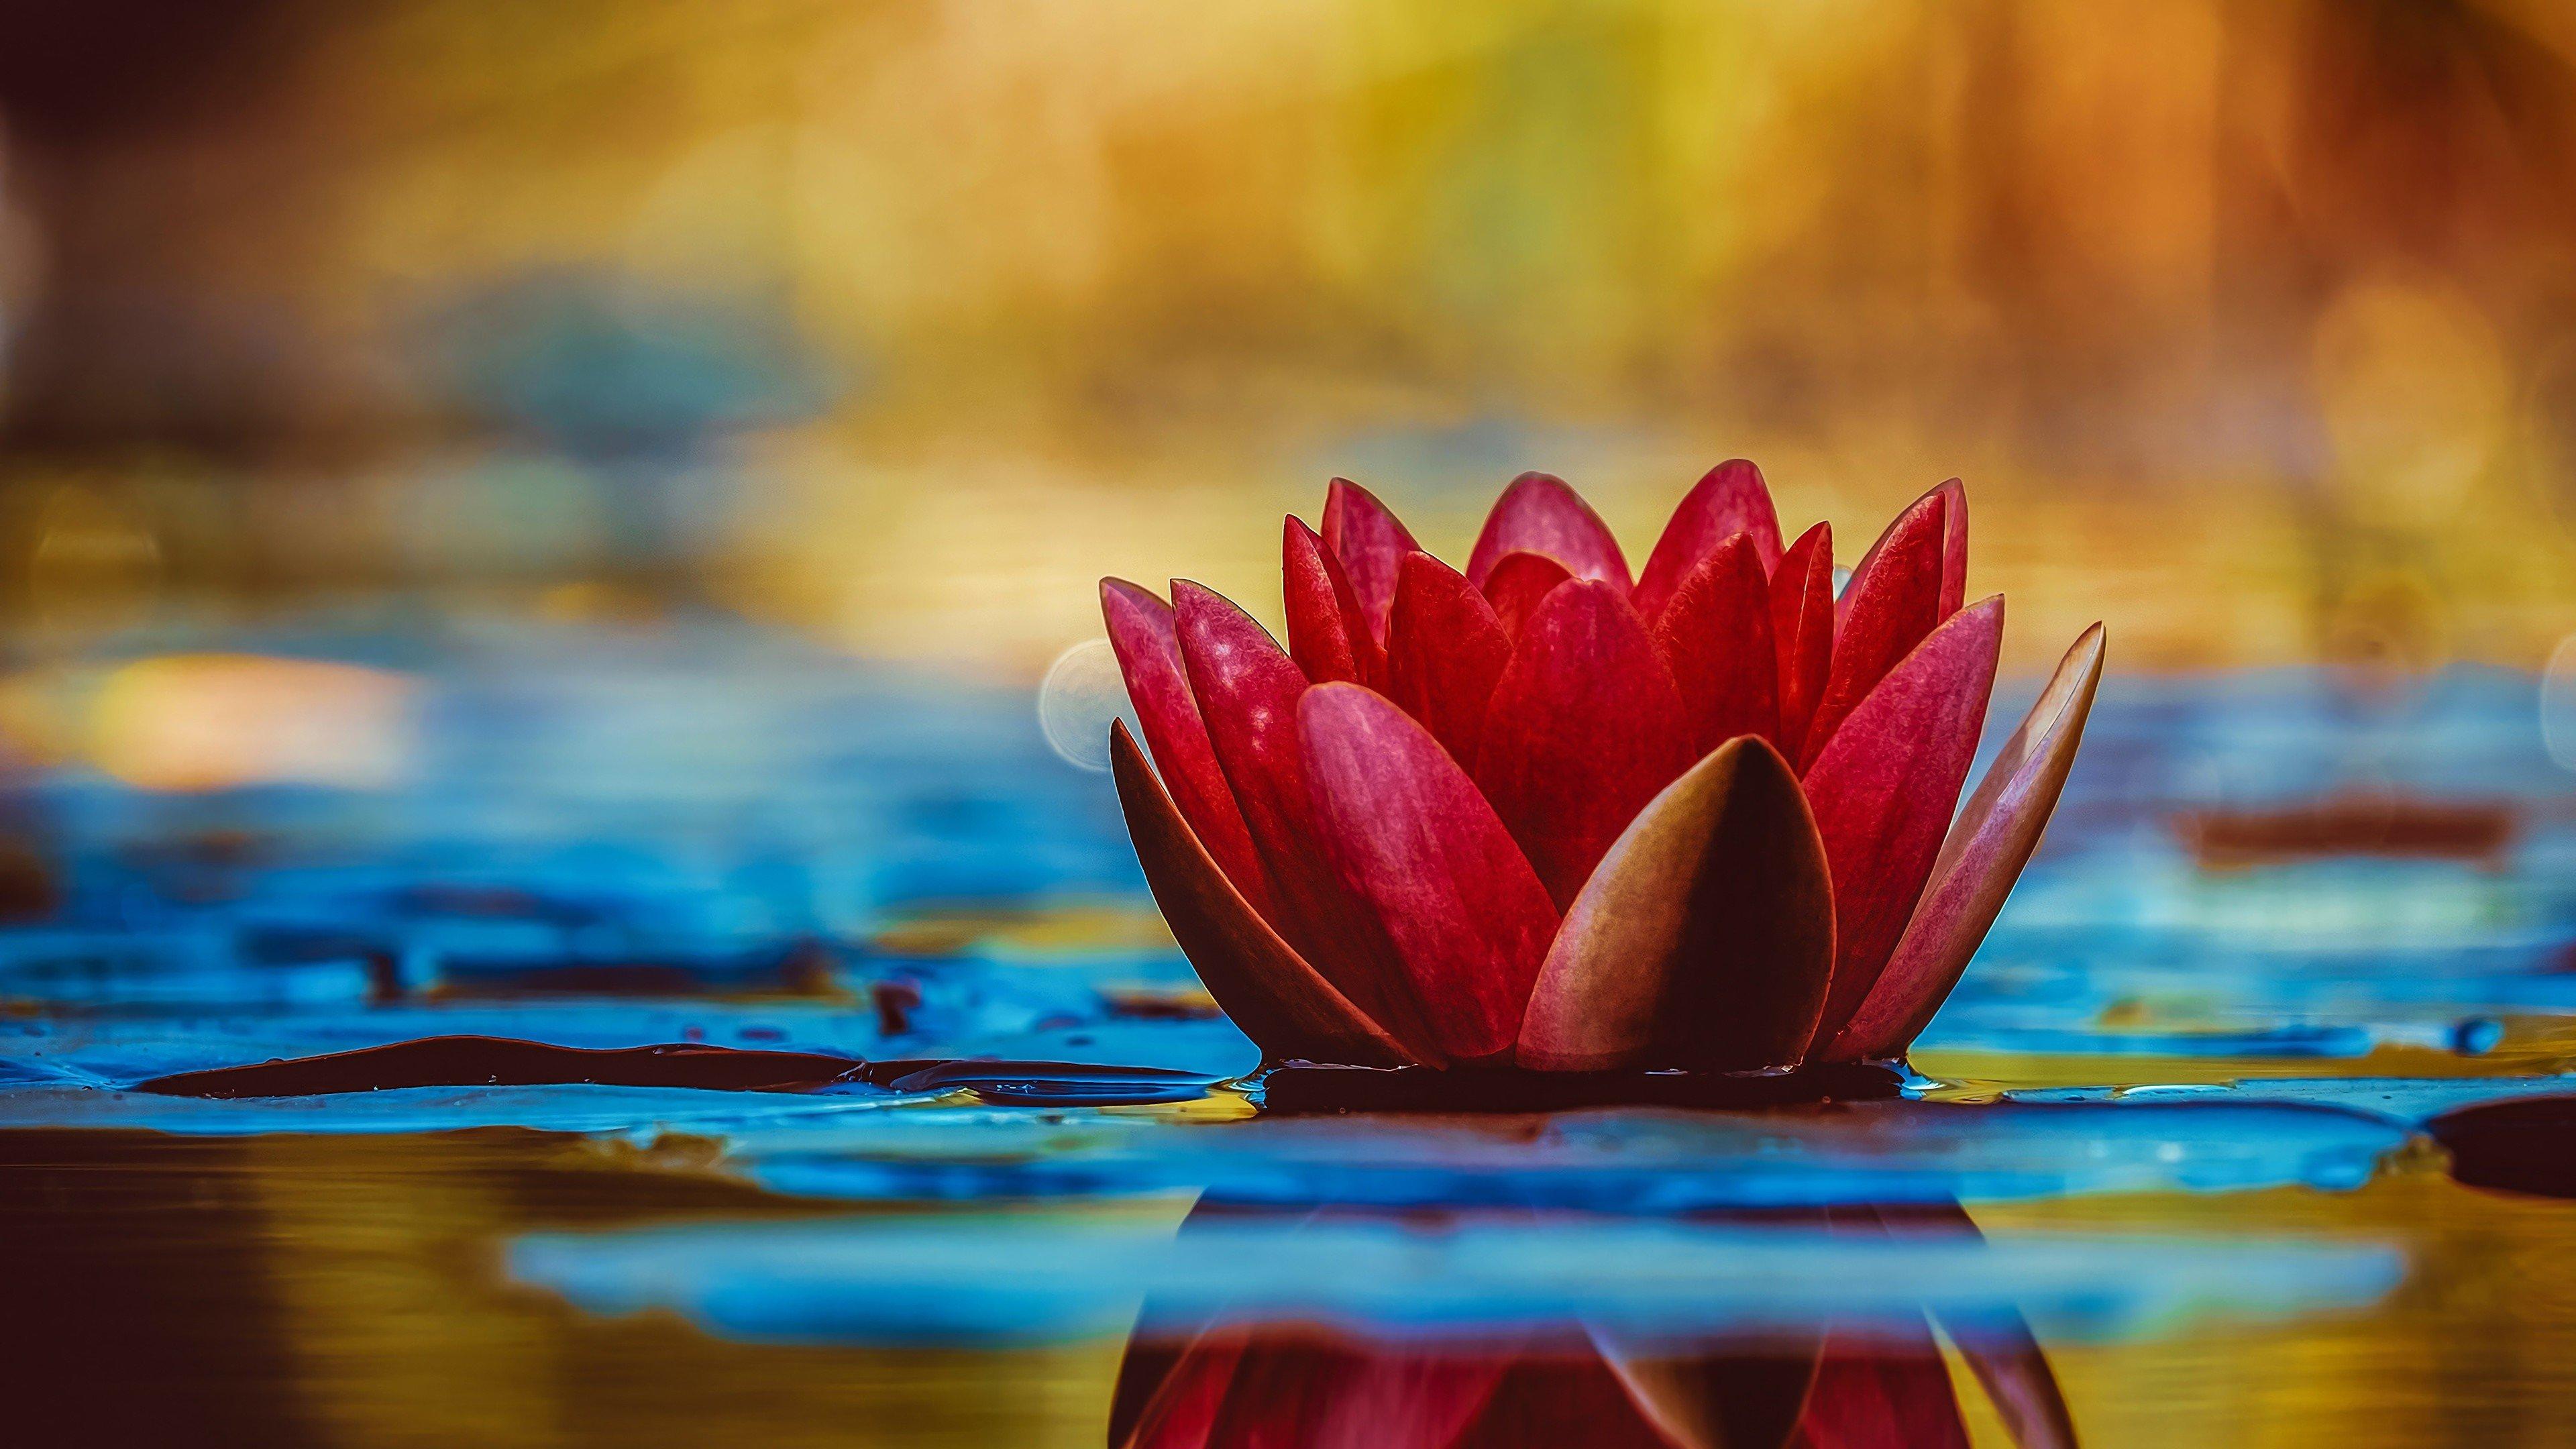 Fondos de pantalla Loto sagrado flotando en agua